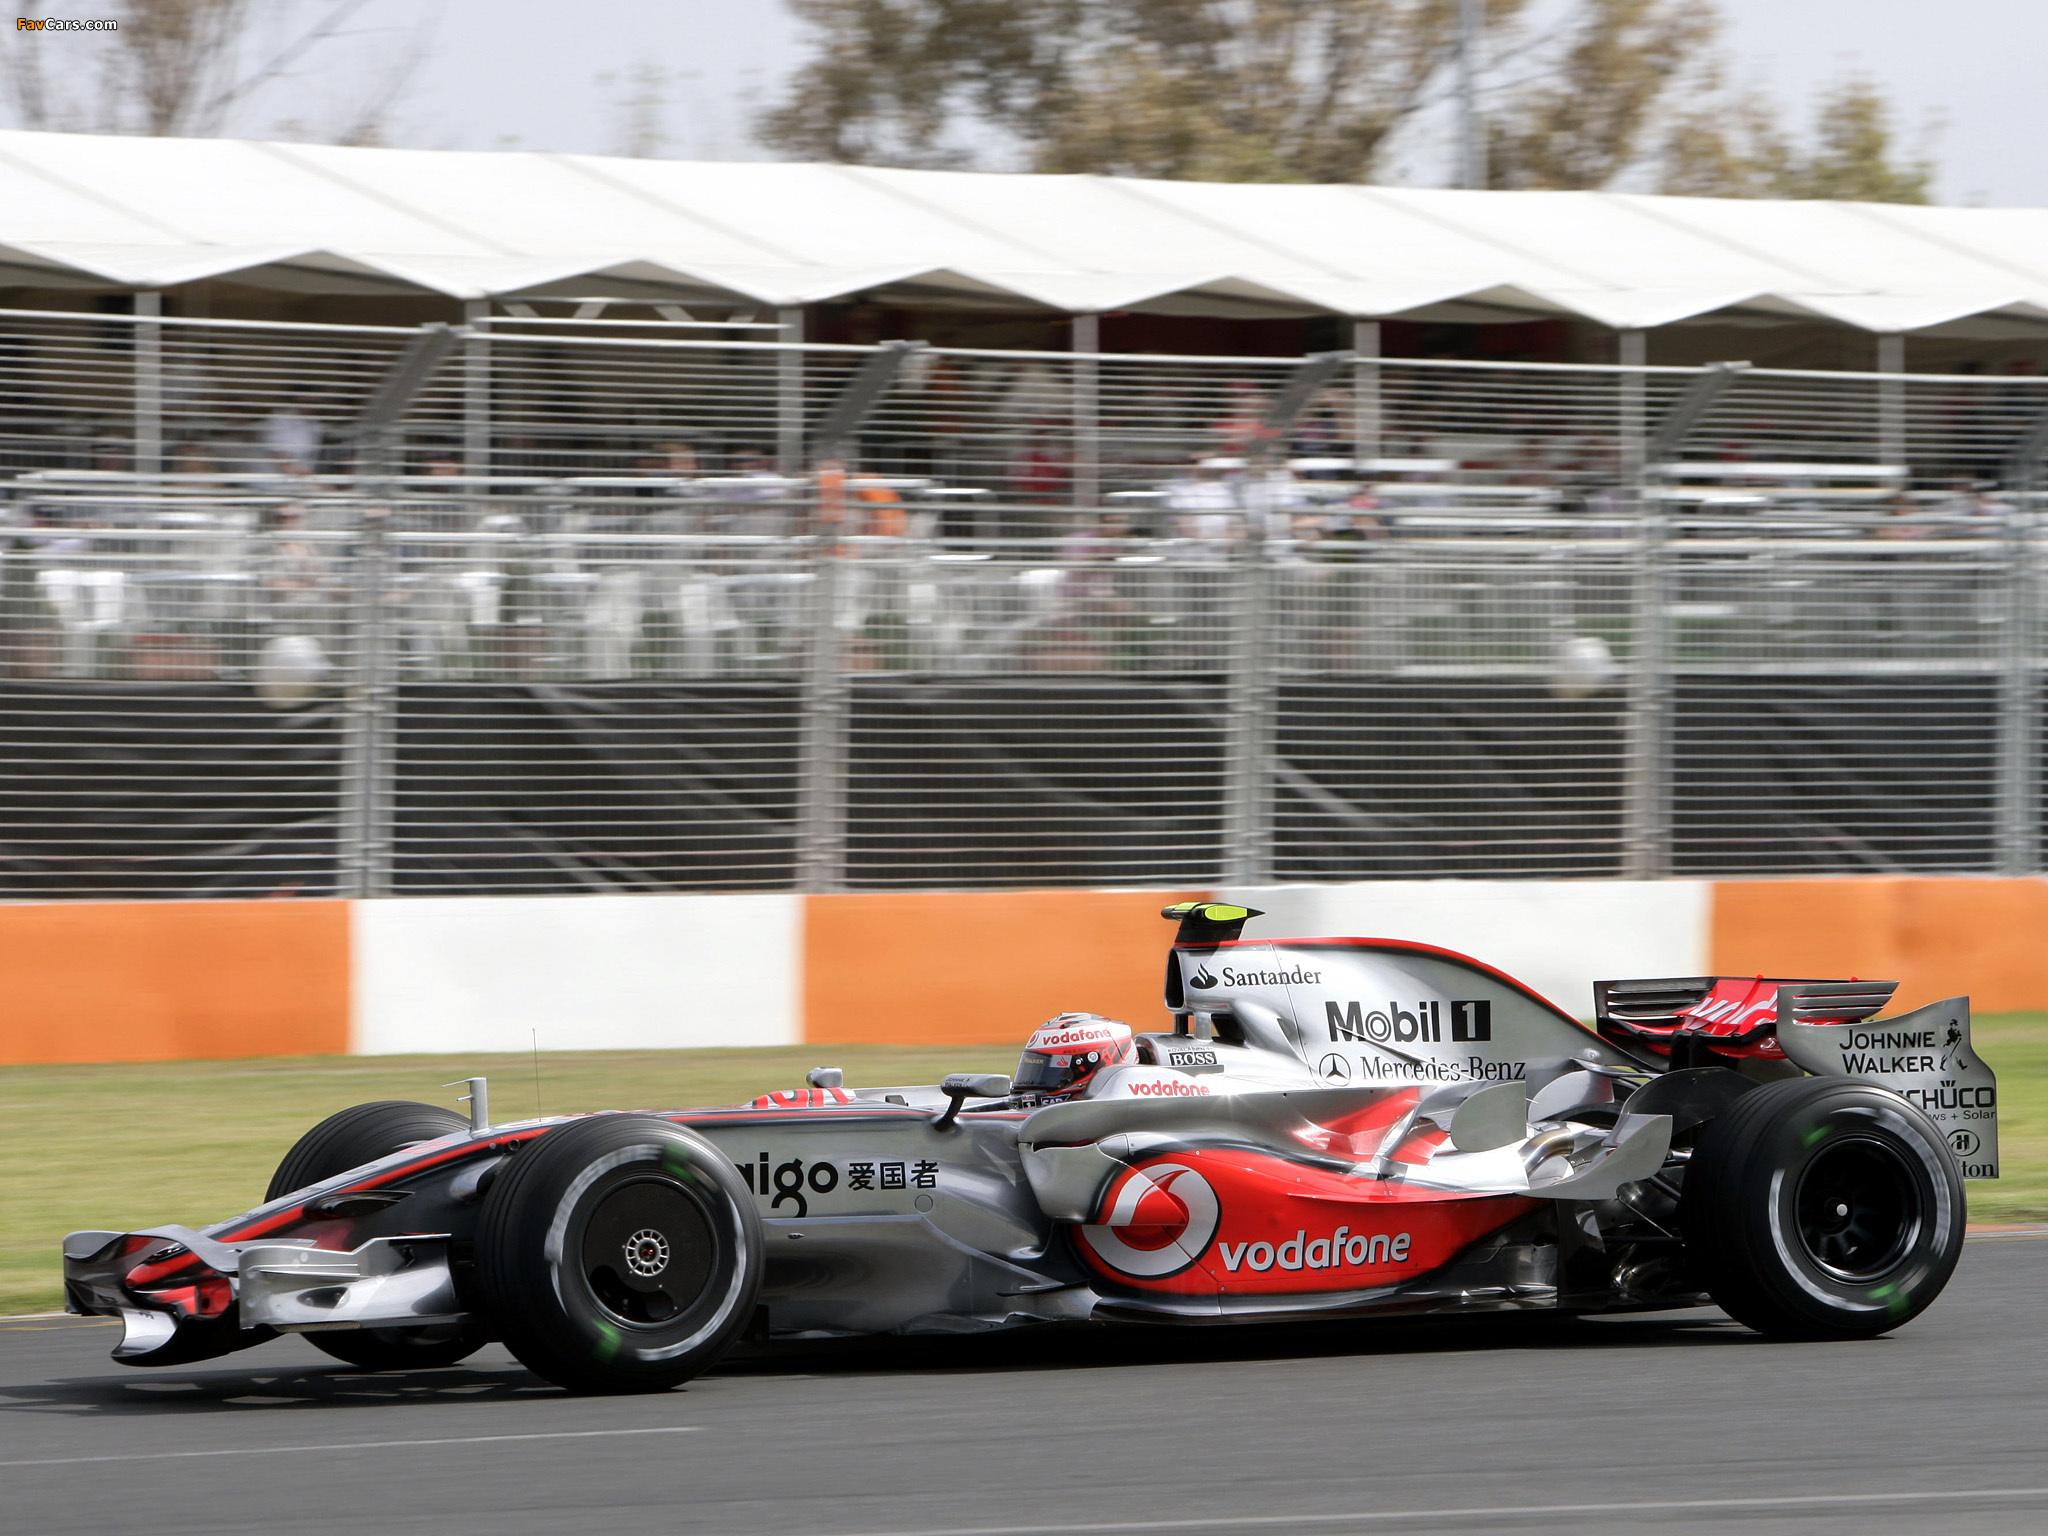 Mercedes Formula One Team Launch 2018 Car Photos and